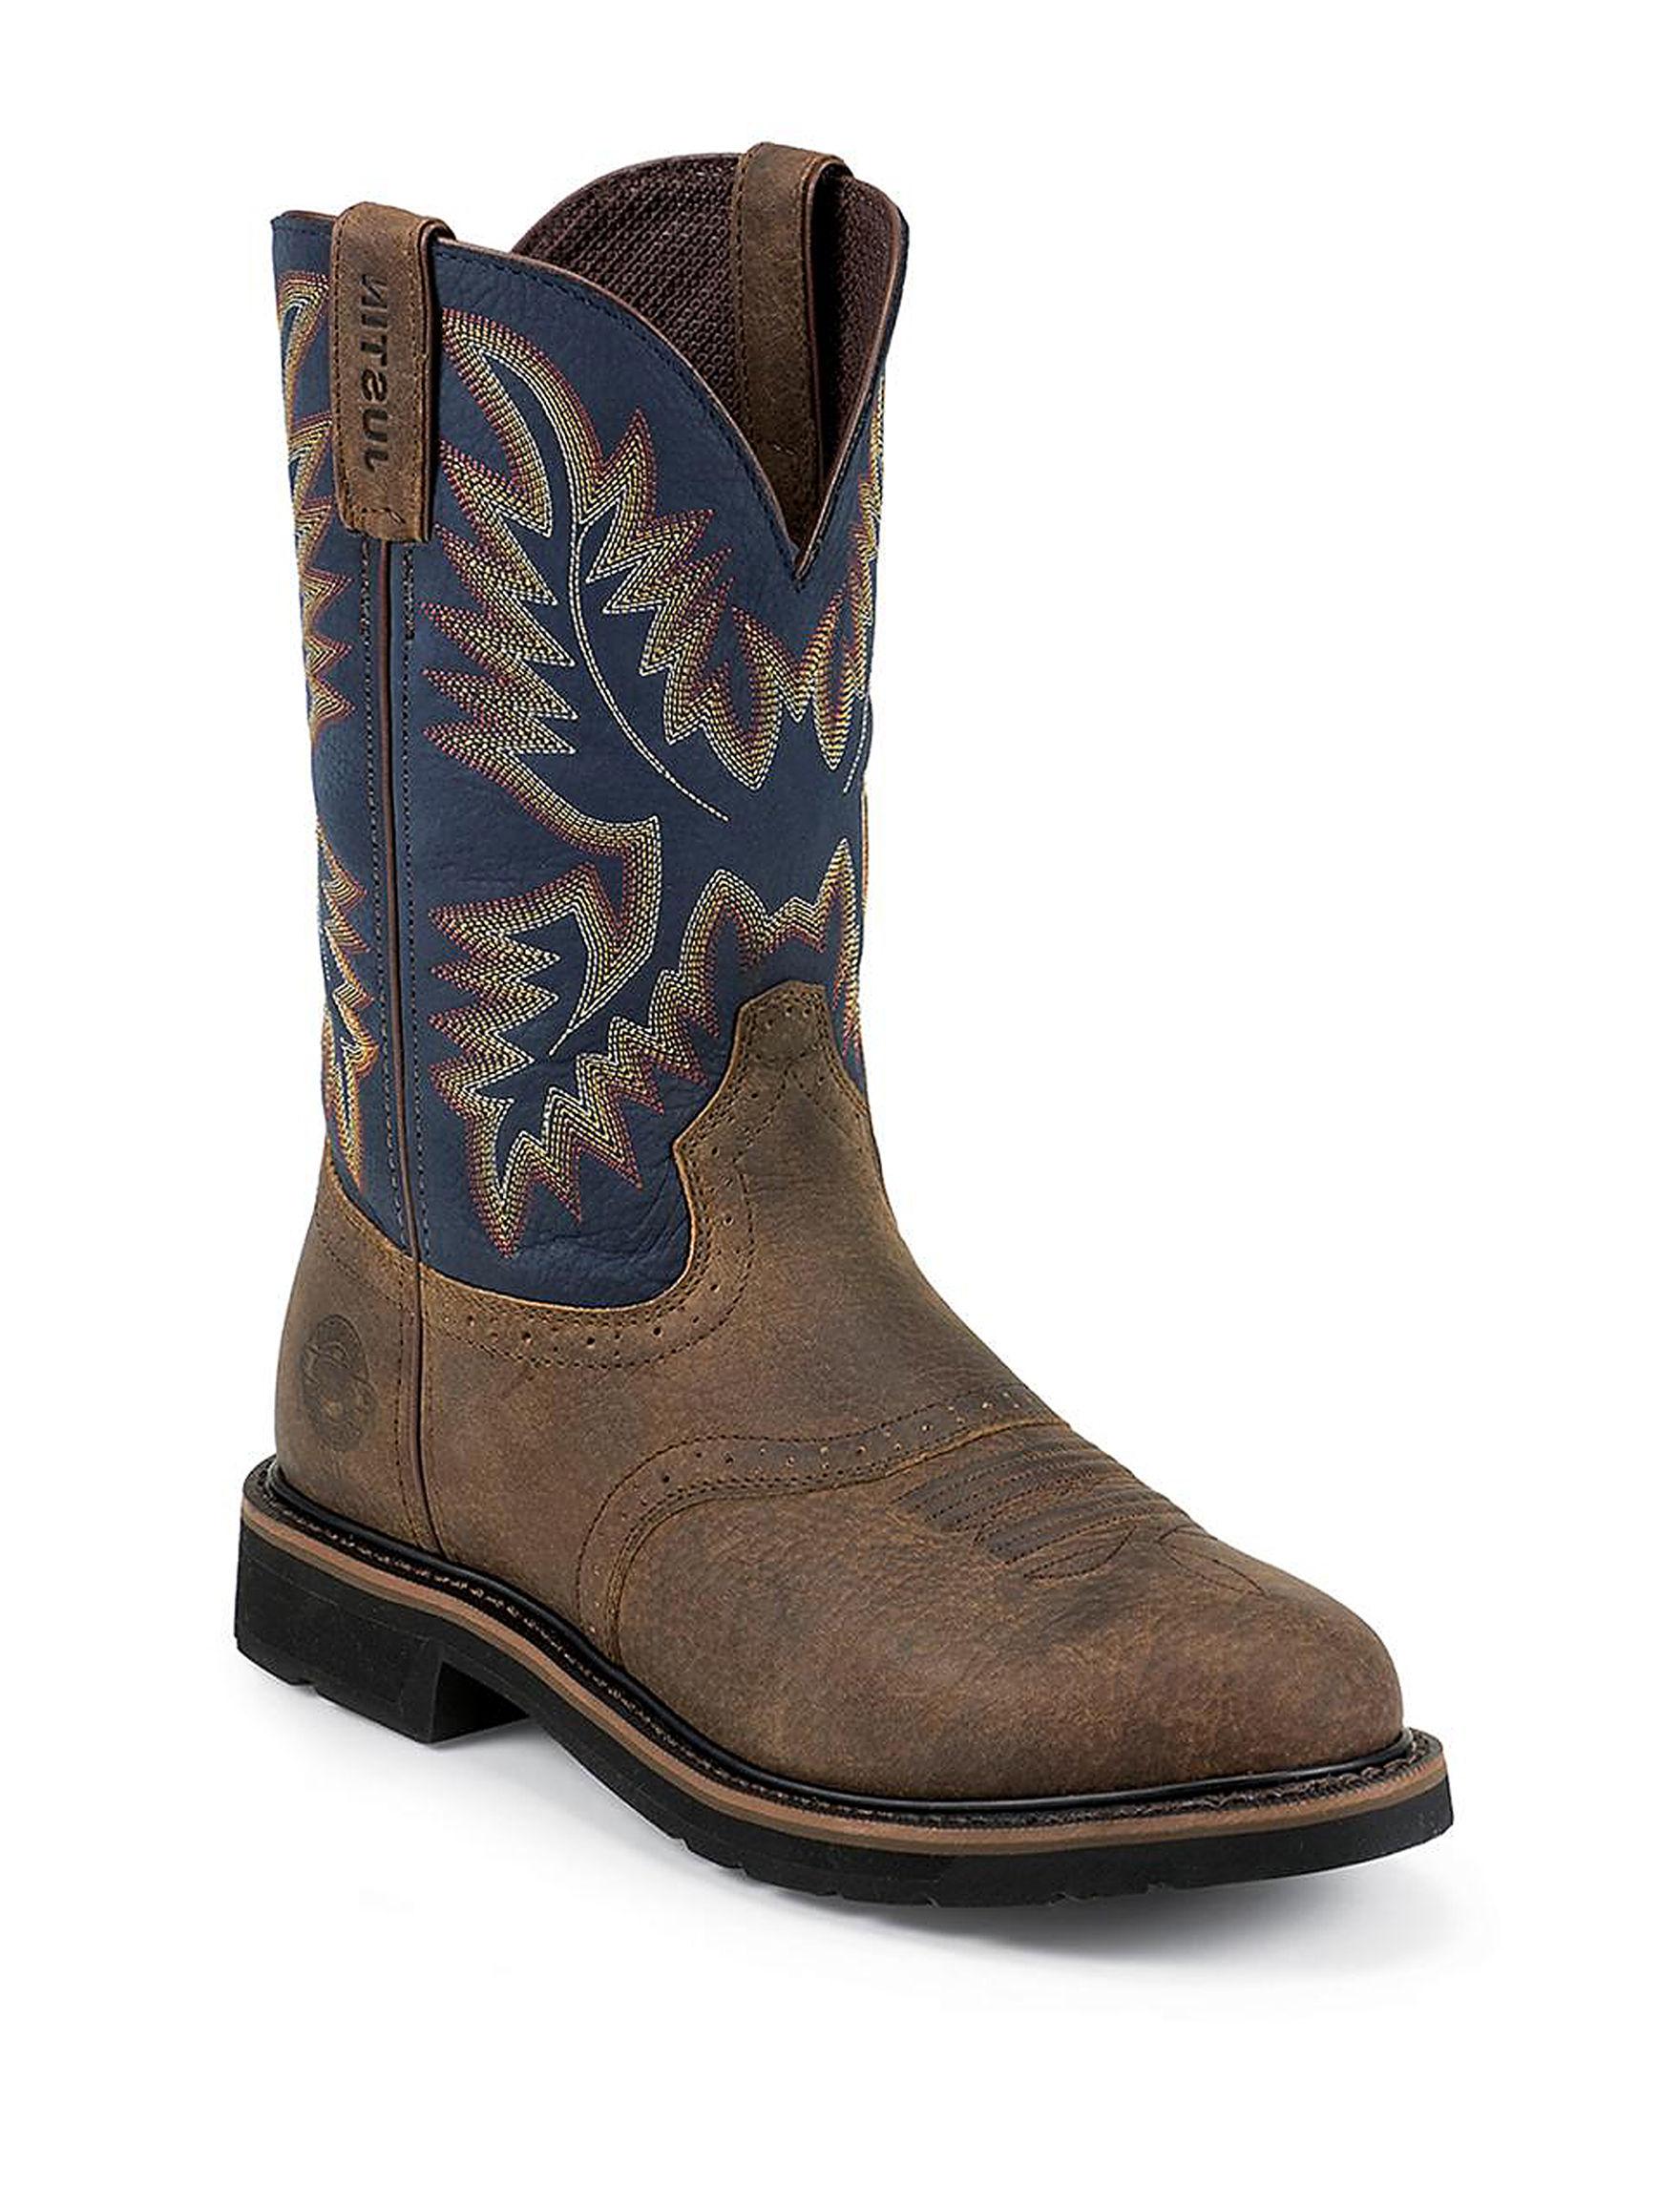 Justin Boots Rust Chukka Boots